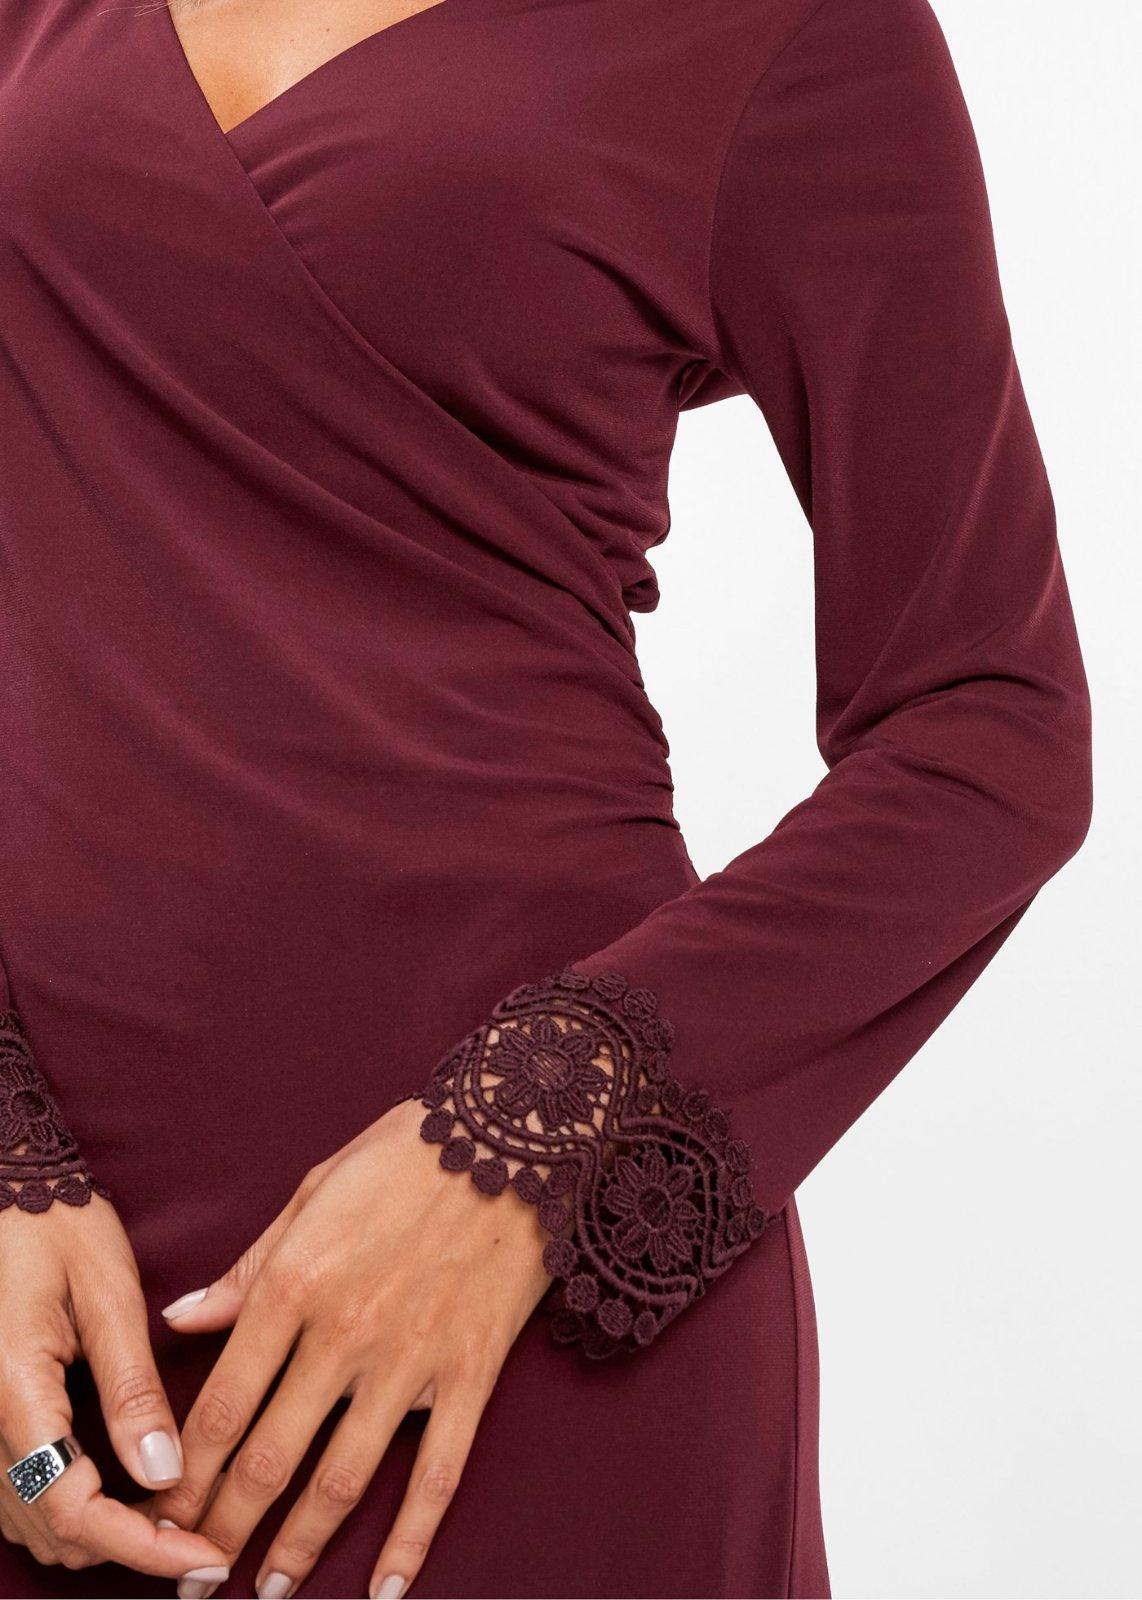 šaty s ozdobnými rukávmi - Obrázok č. 4